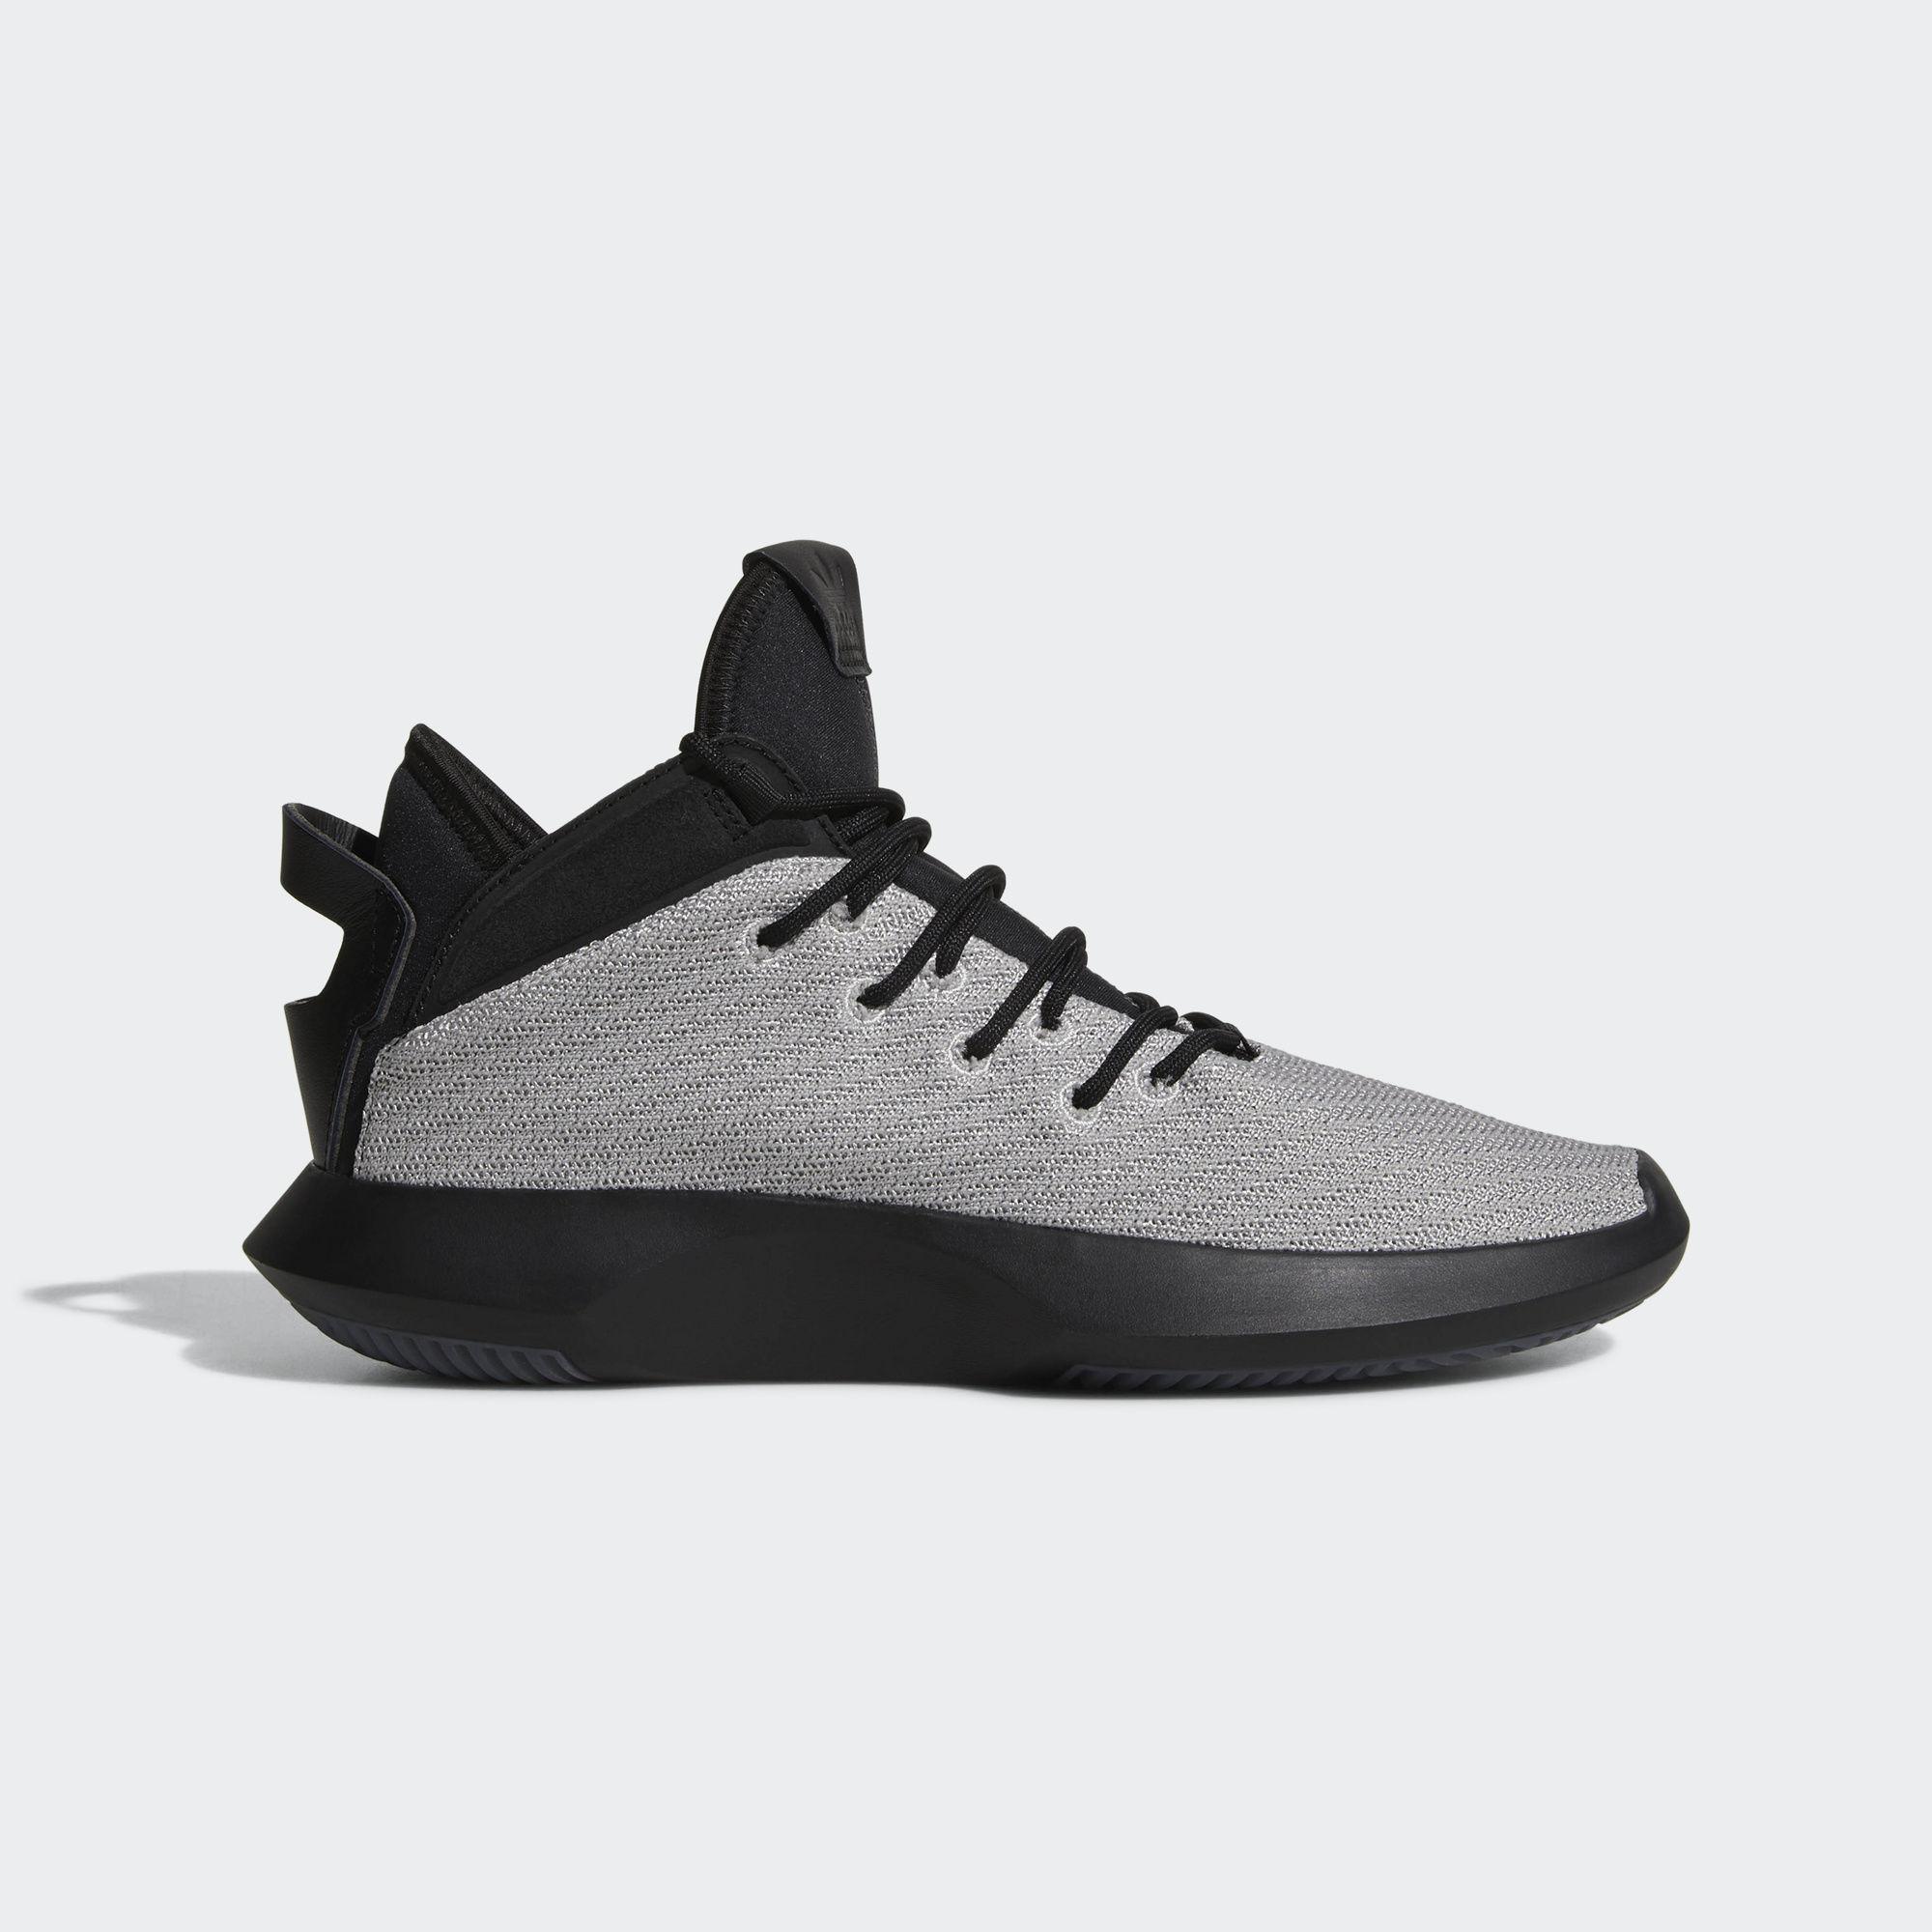 new style 67295 6d8cd adidas. Mens Black Crazy 1 Adv Primeknit Shoes